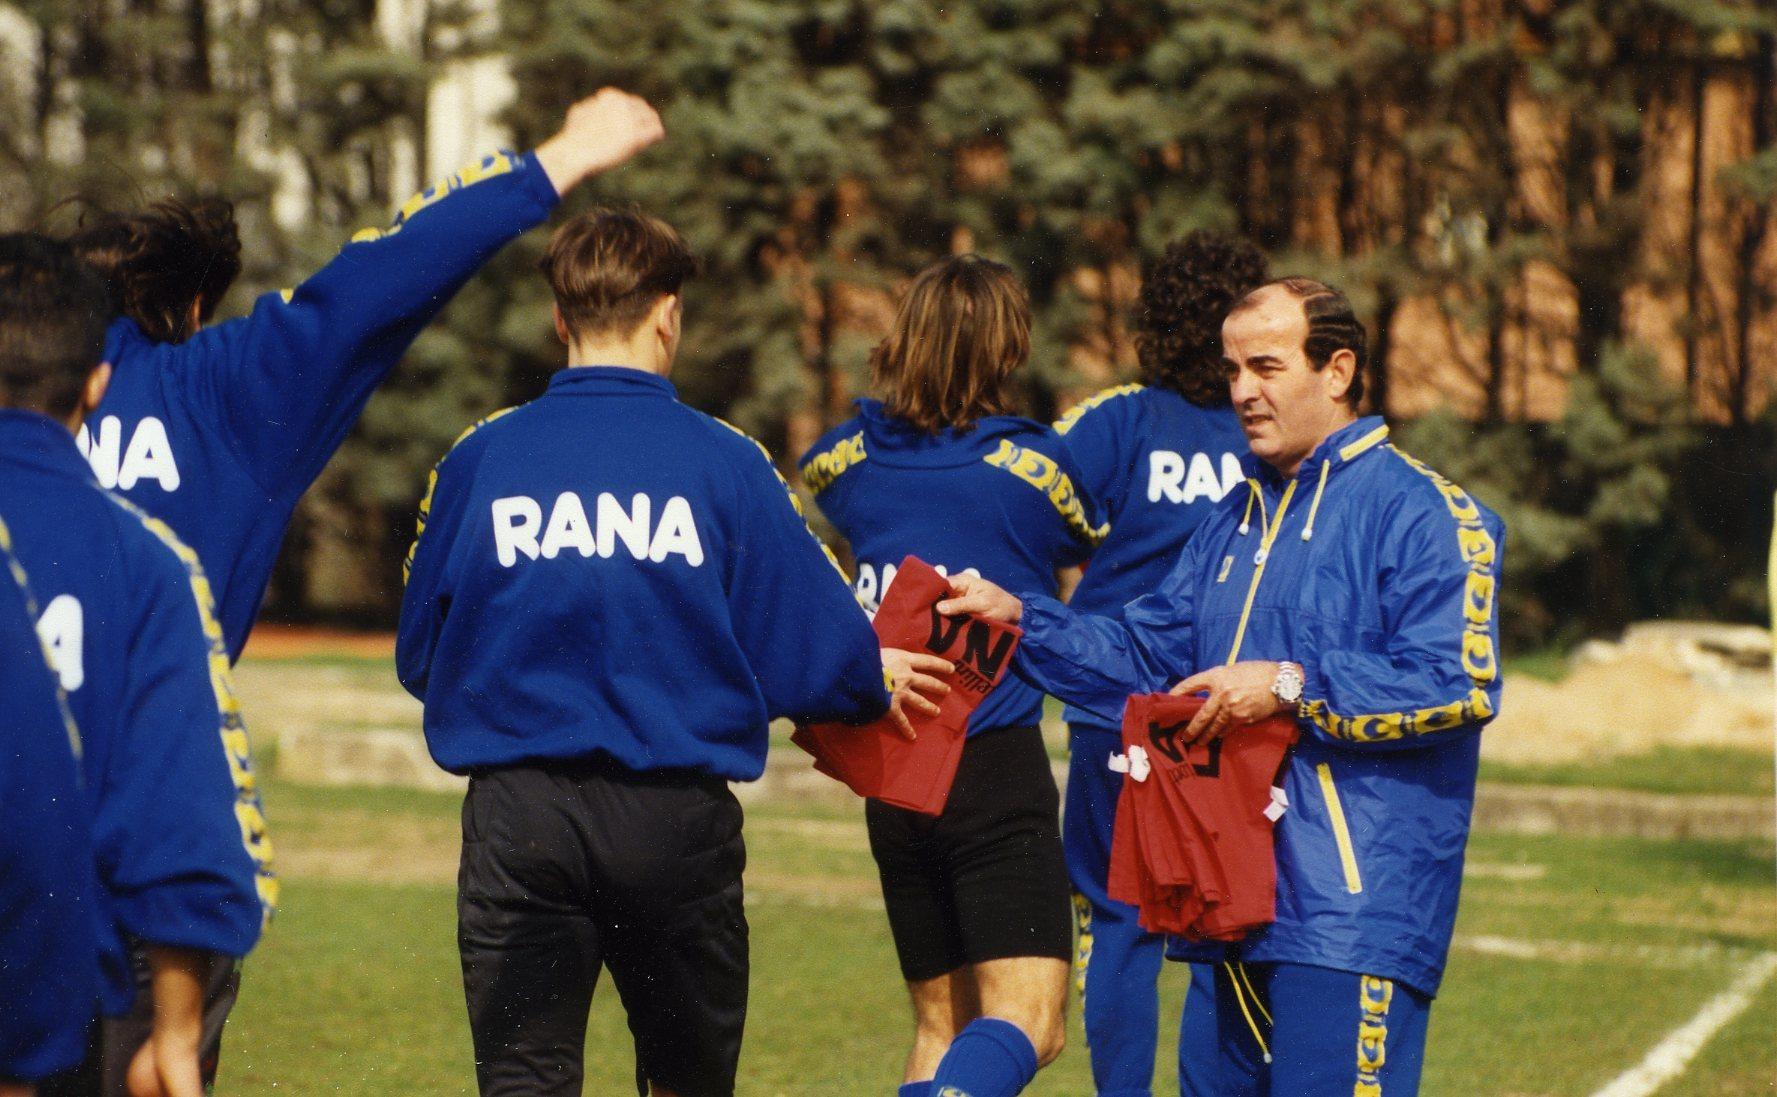 MARIO CORSO Calcio: Mario Corso allenatore del Verona nel campionato 1991/1992